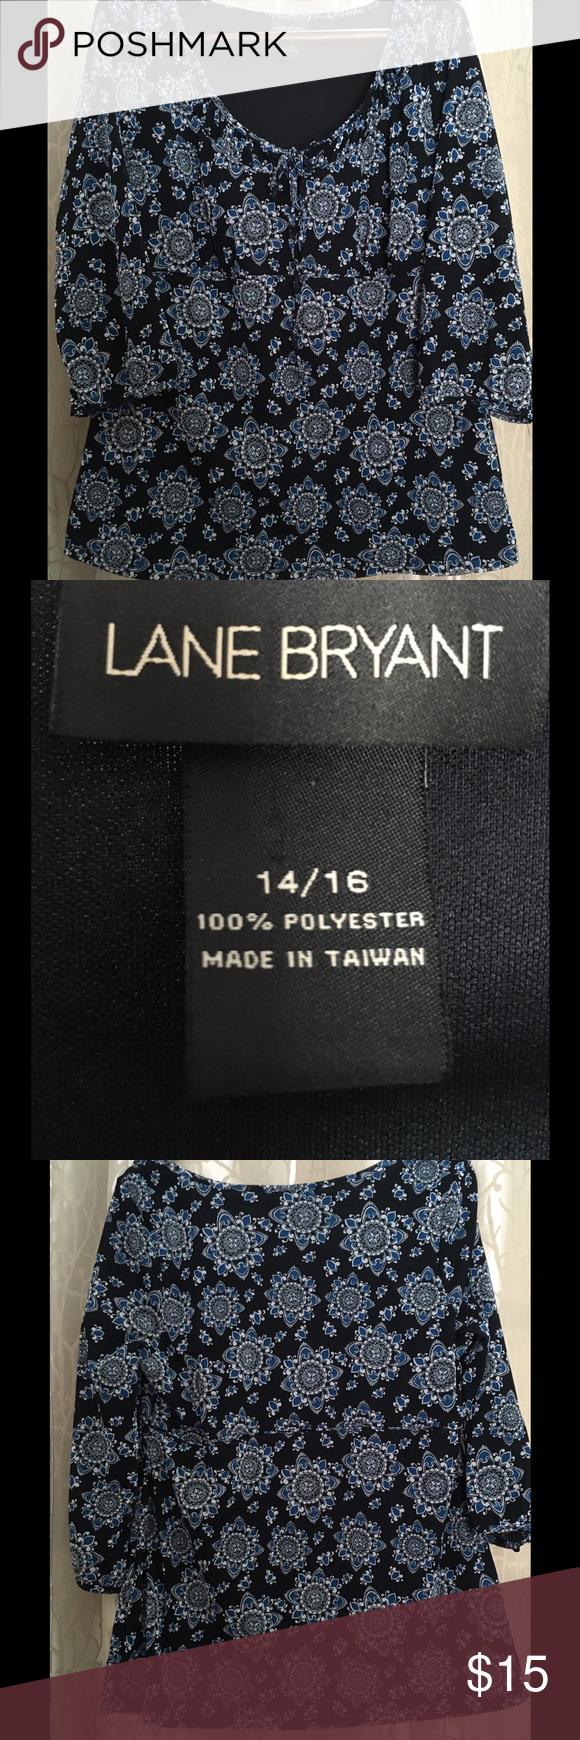 Ladies Lane Bryan blue/black shirt sz 14/16 Adorable denim blue and black soft pullover shirt.  Sz 14/16 Lane Bryant Tops Tunics